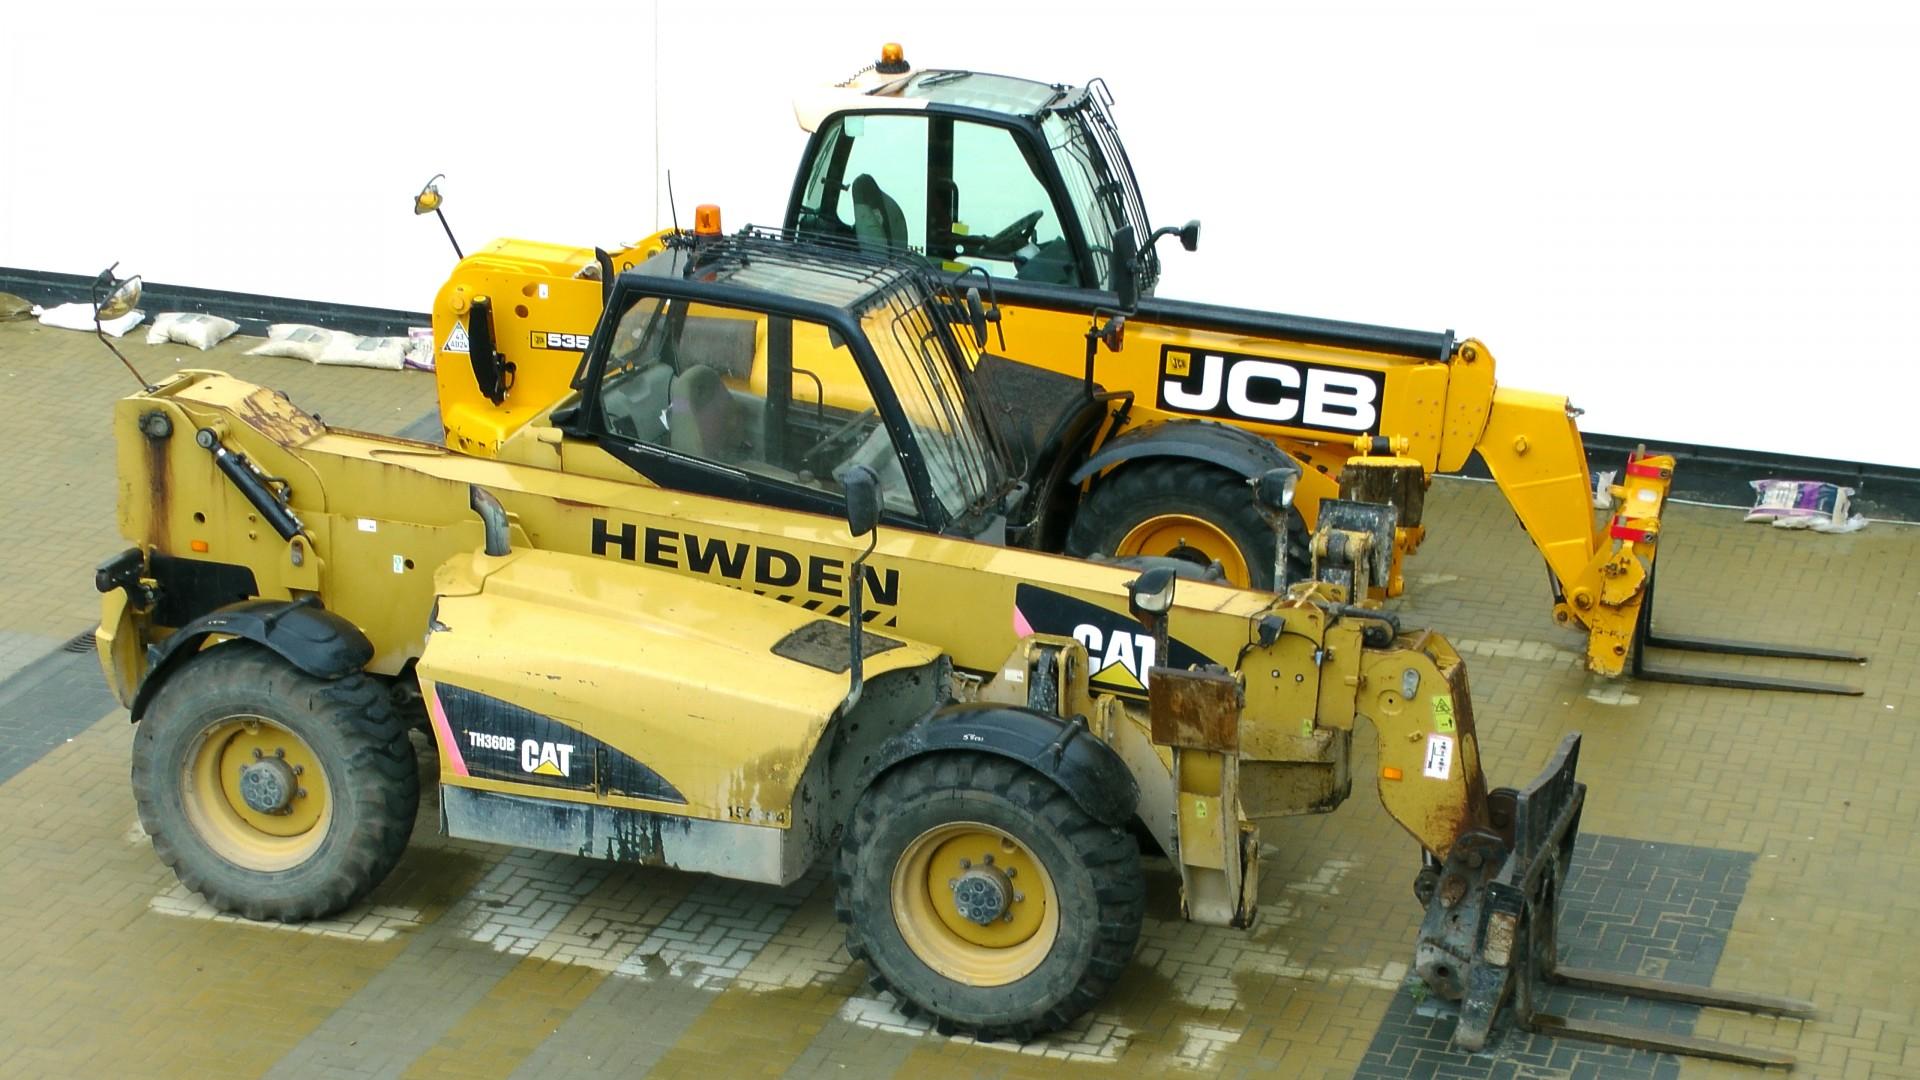 2-jcb-forklift-trucks